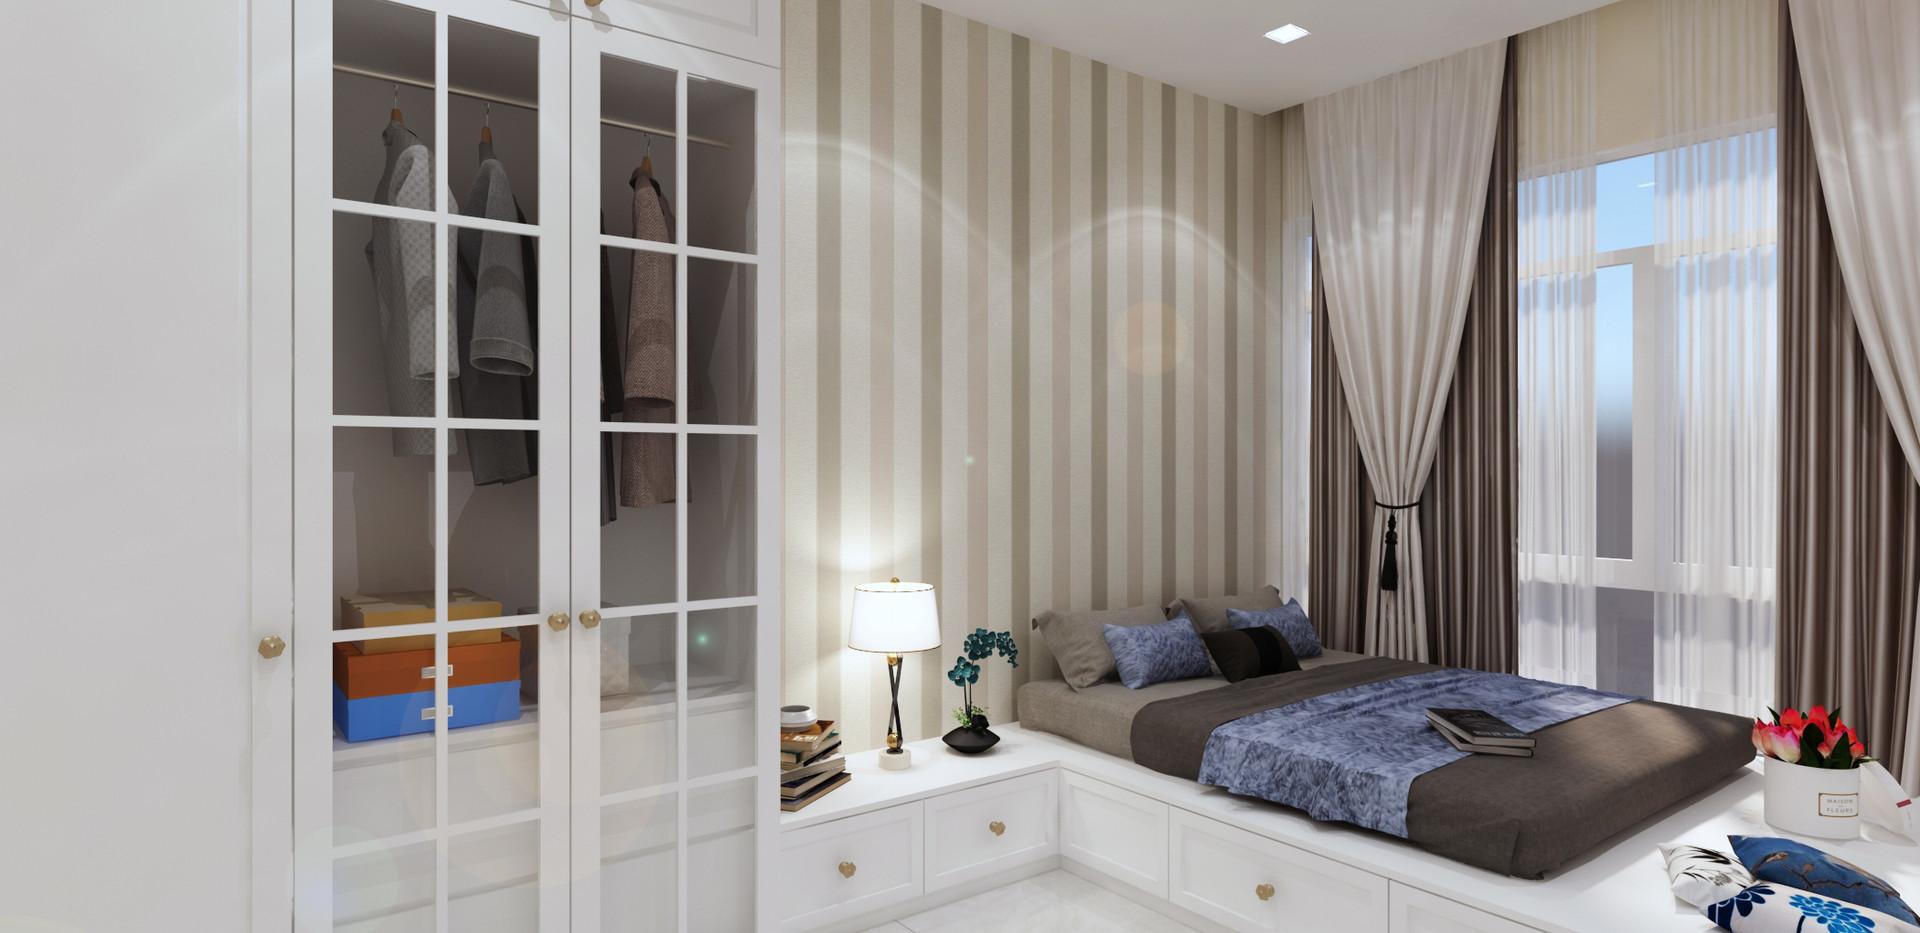 20190509_Bedroom .jpg